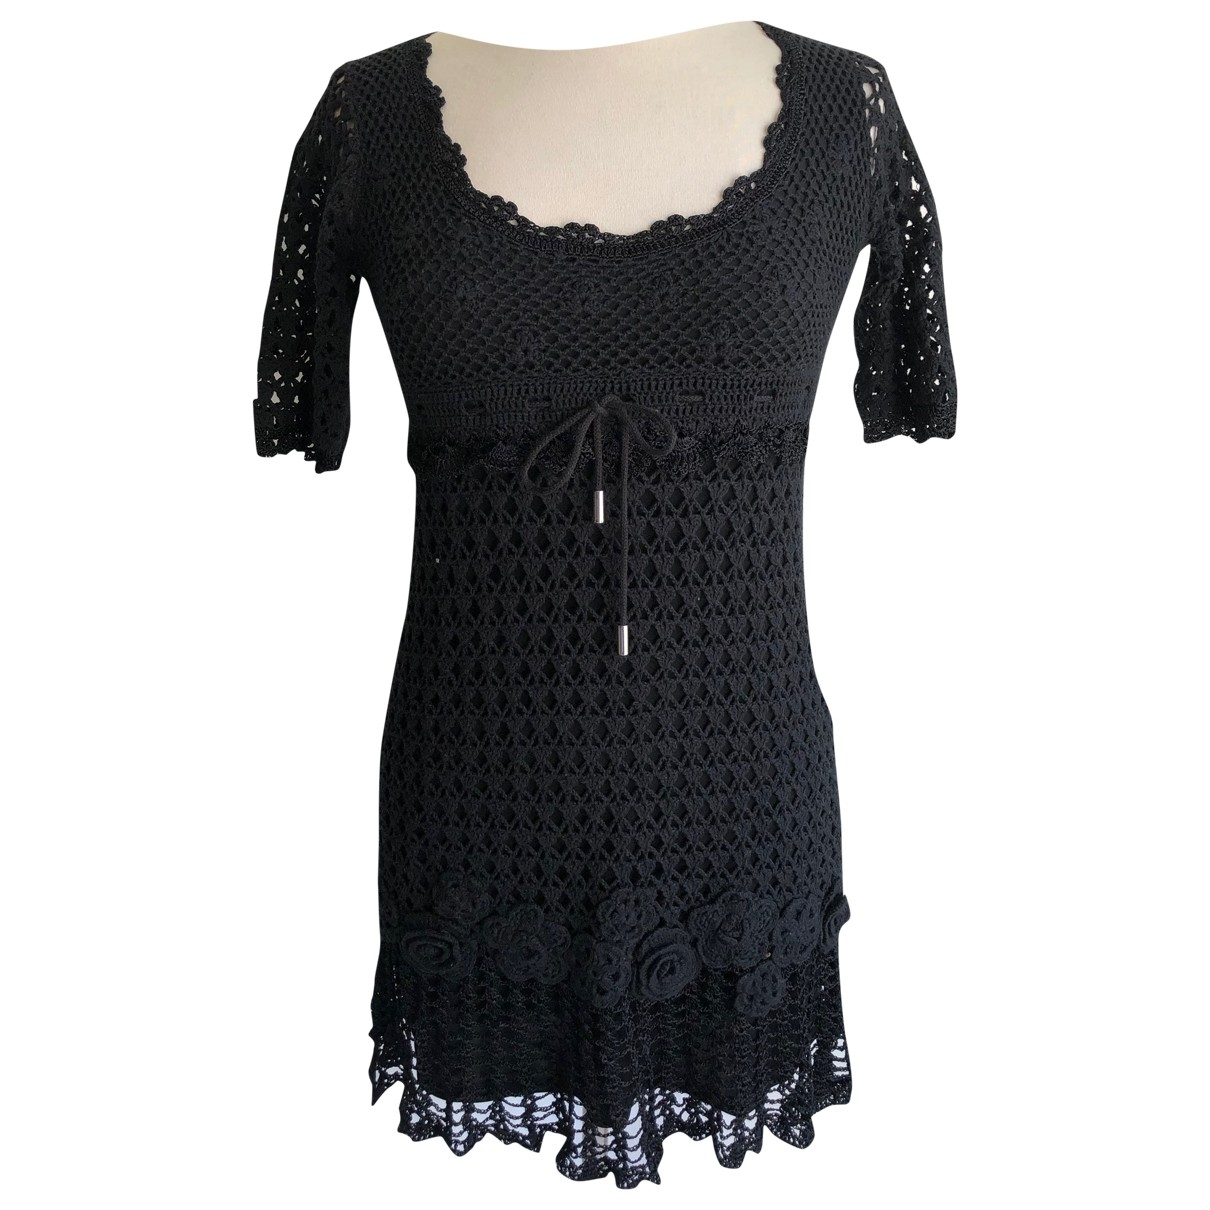 Karen Millen \N Black Cotton dress for Women 2 0-5